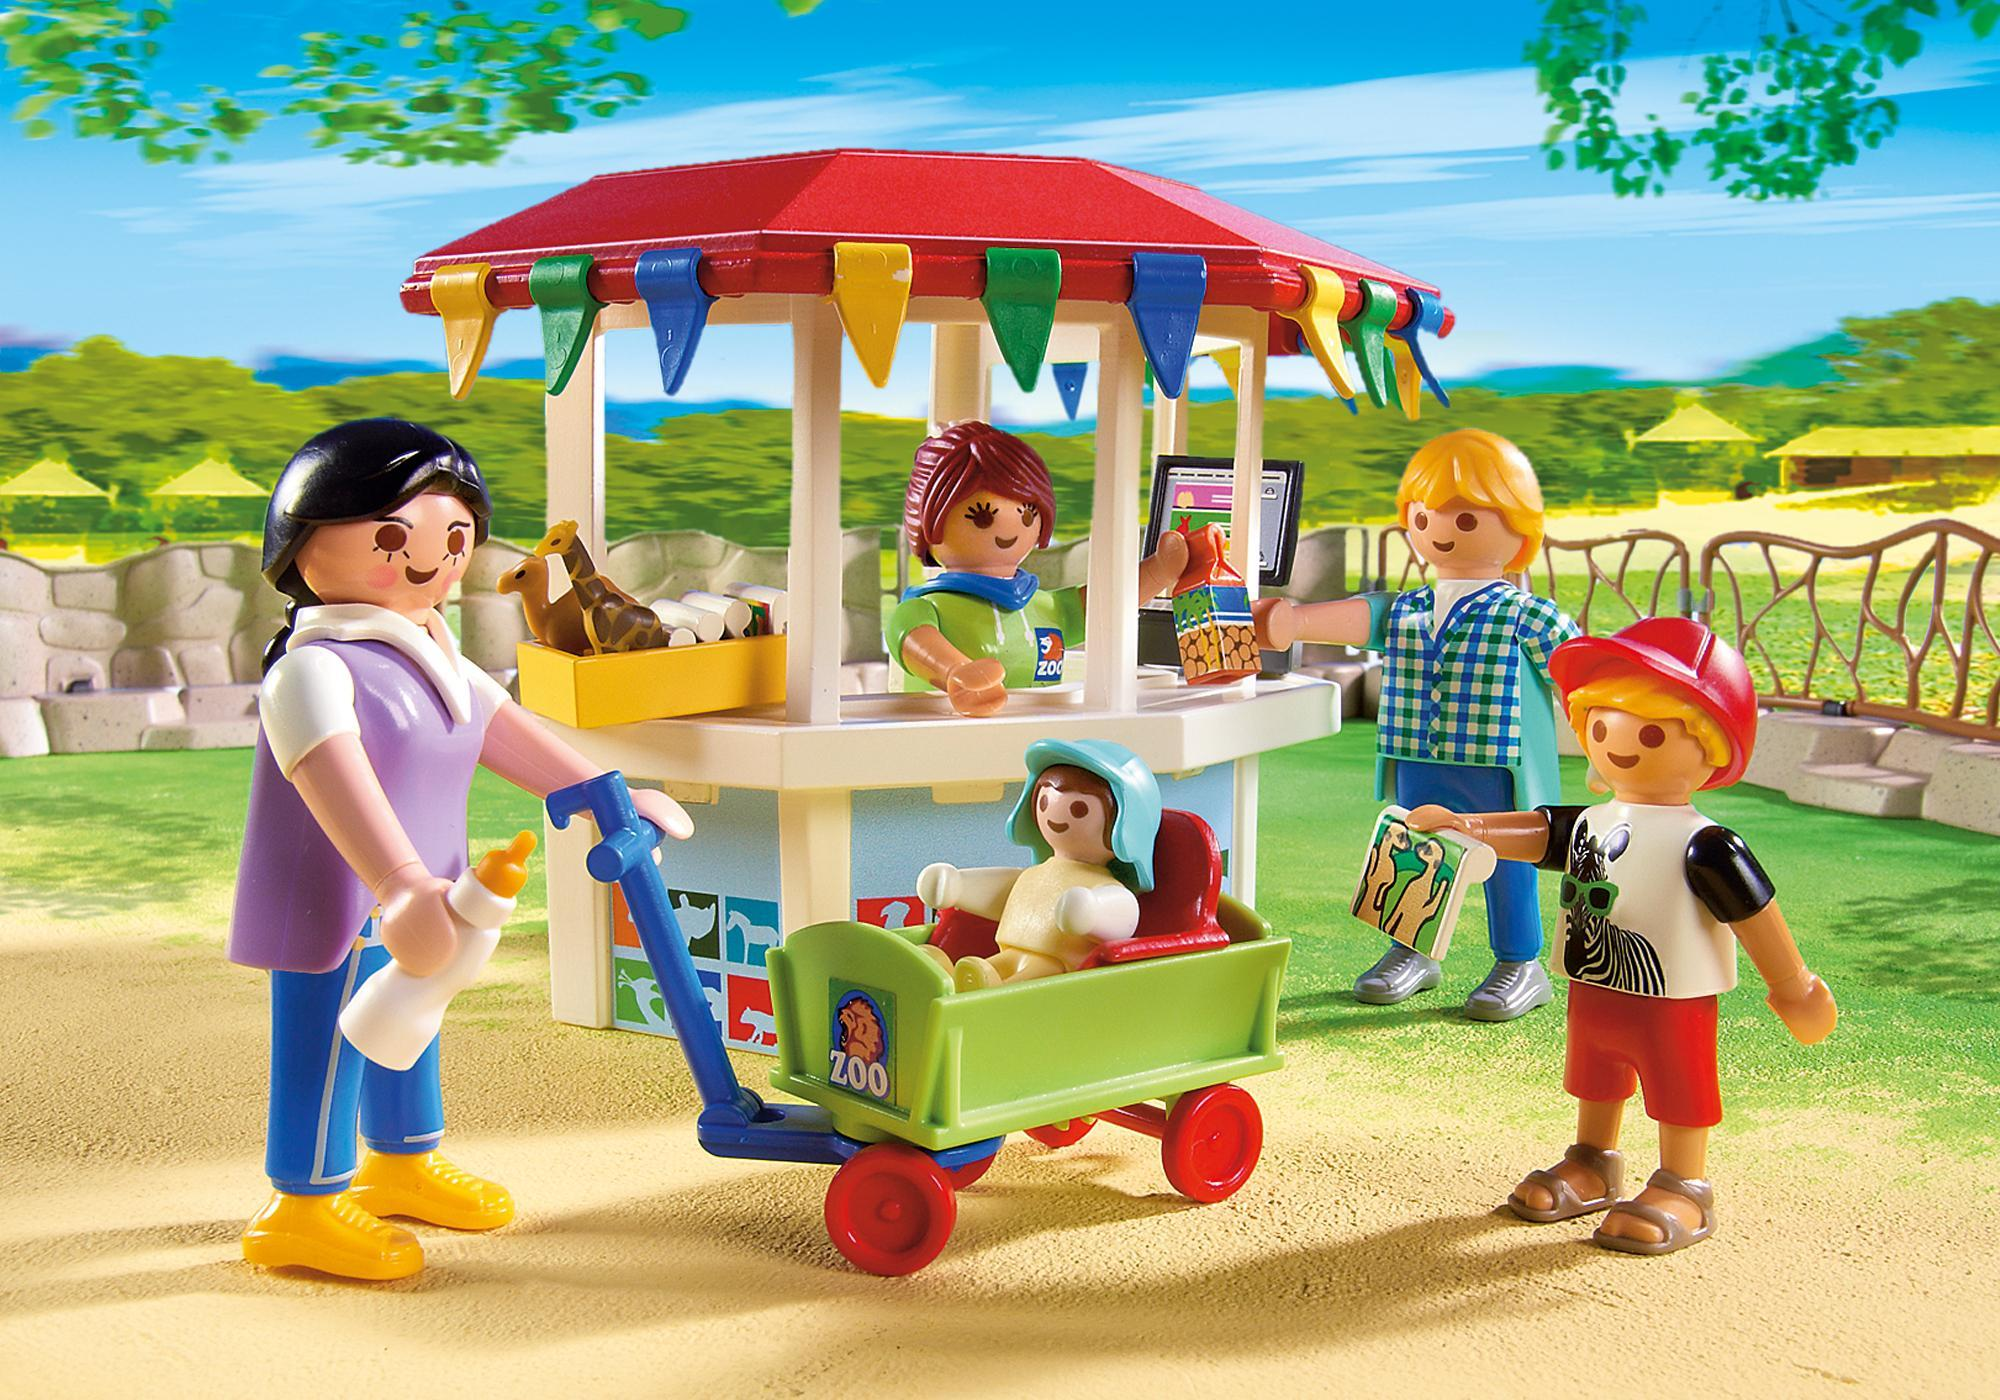 http://media.playmobil.com/i/playmobil/6634_product_extra1